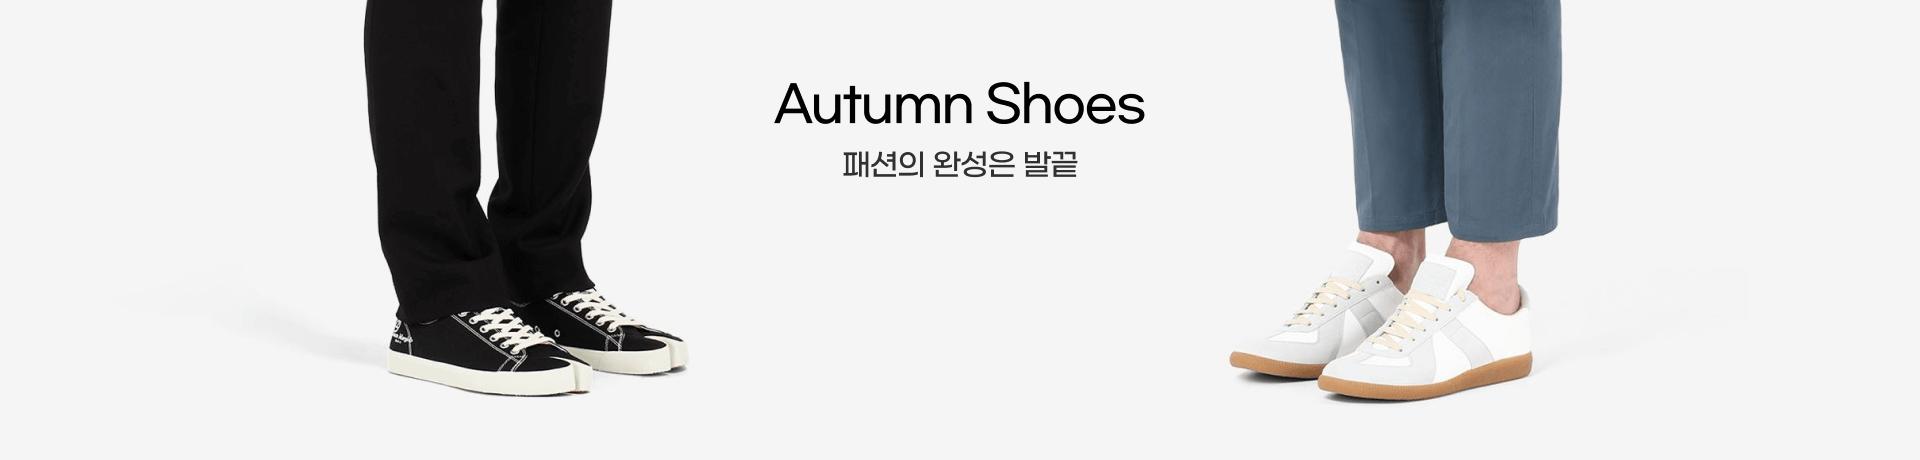 211018_sk_autumn-shoes_pc_f2f2f2